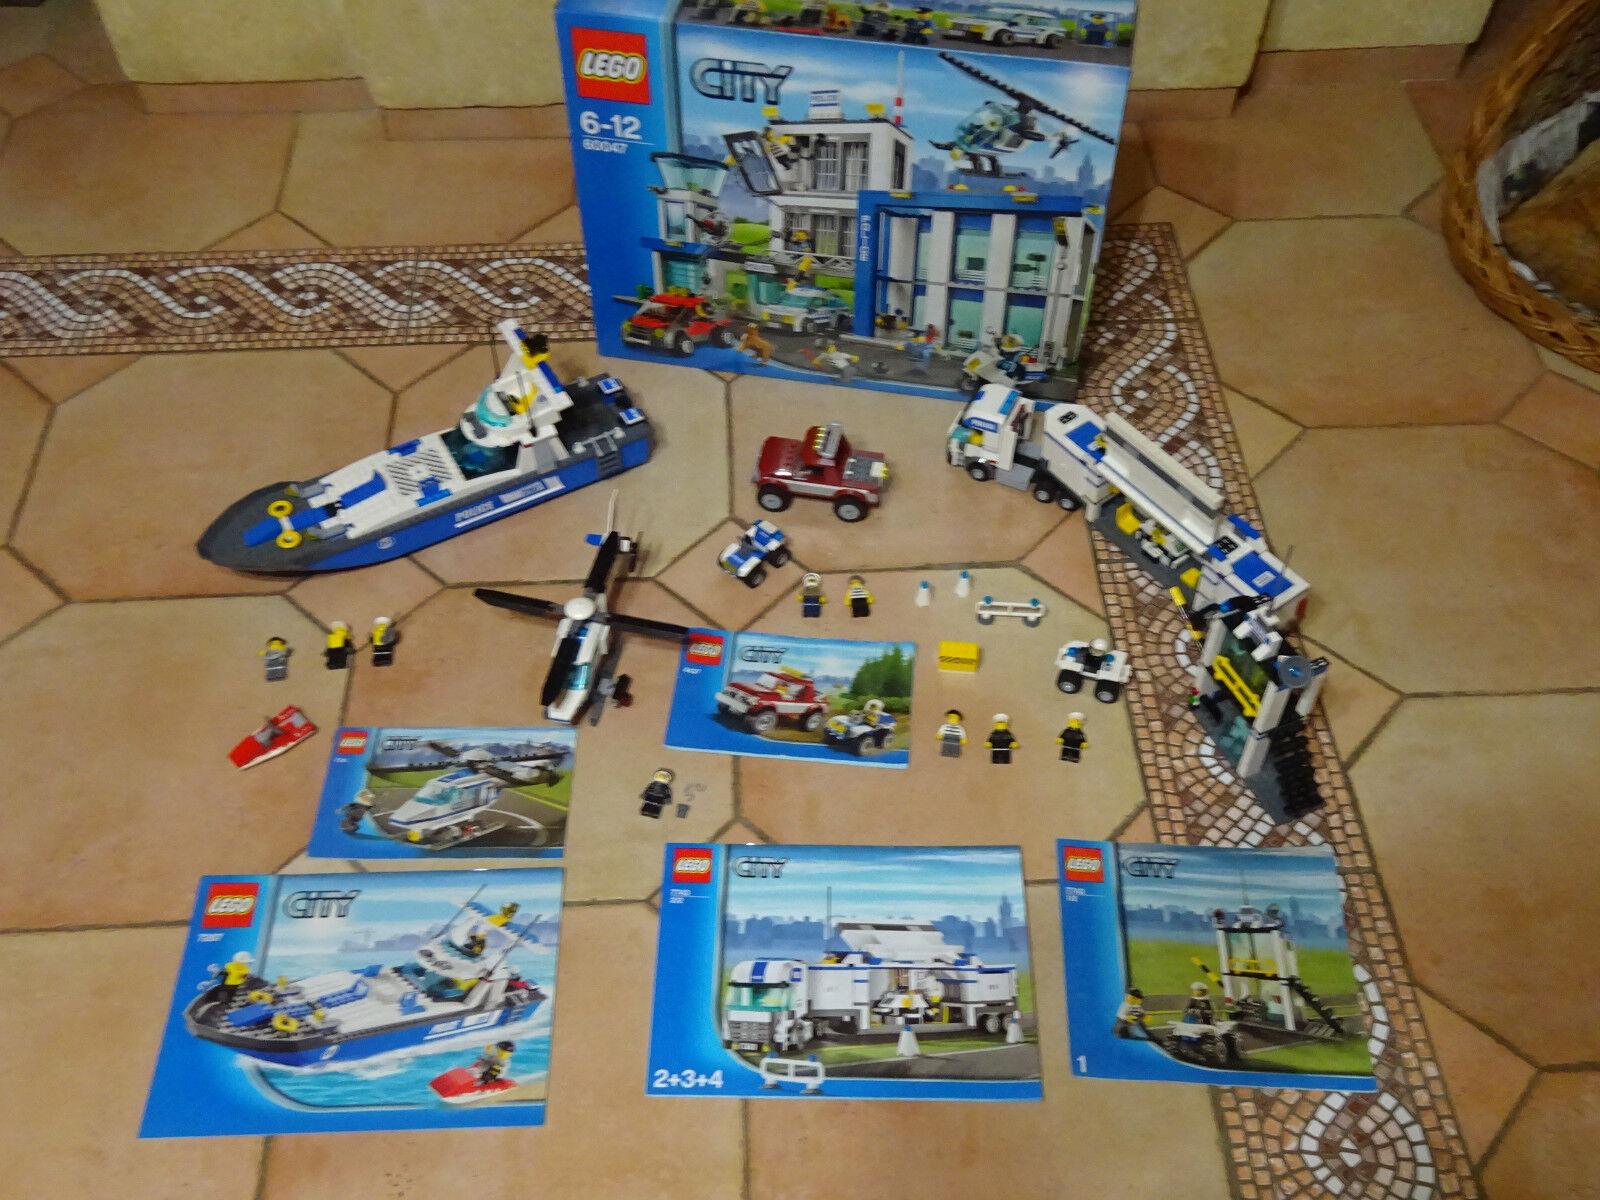 LOT LEGO CITY  60047  Commissariat de police - NEUF 4437774172877743 COMPLT